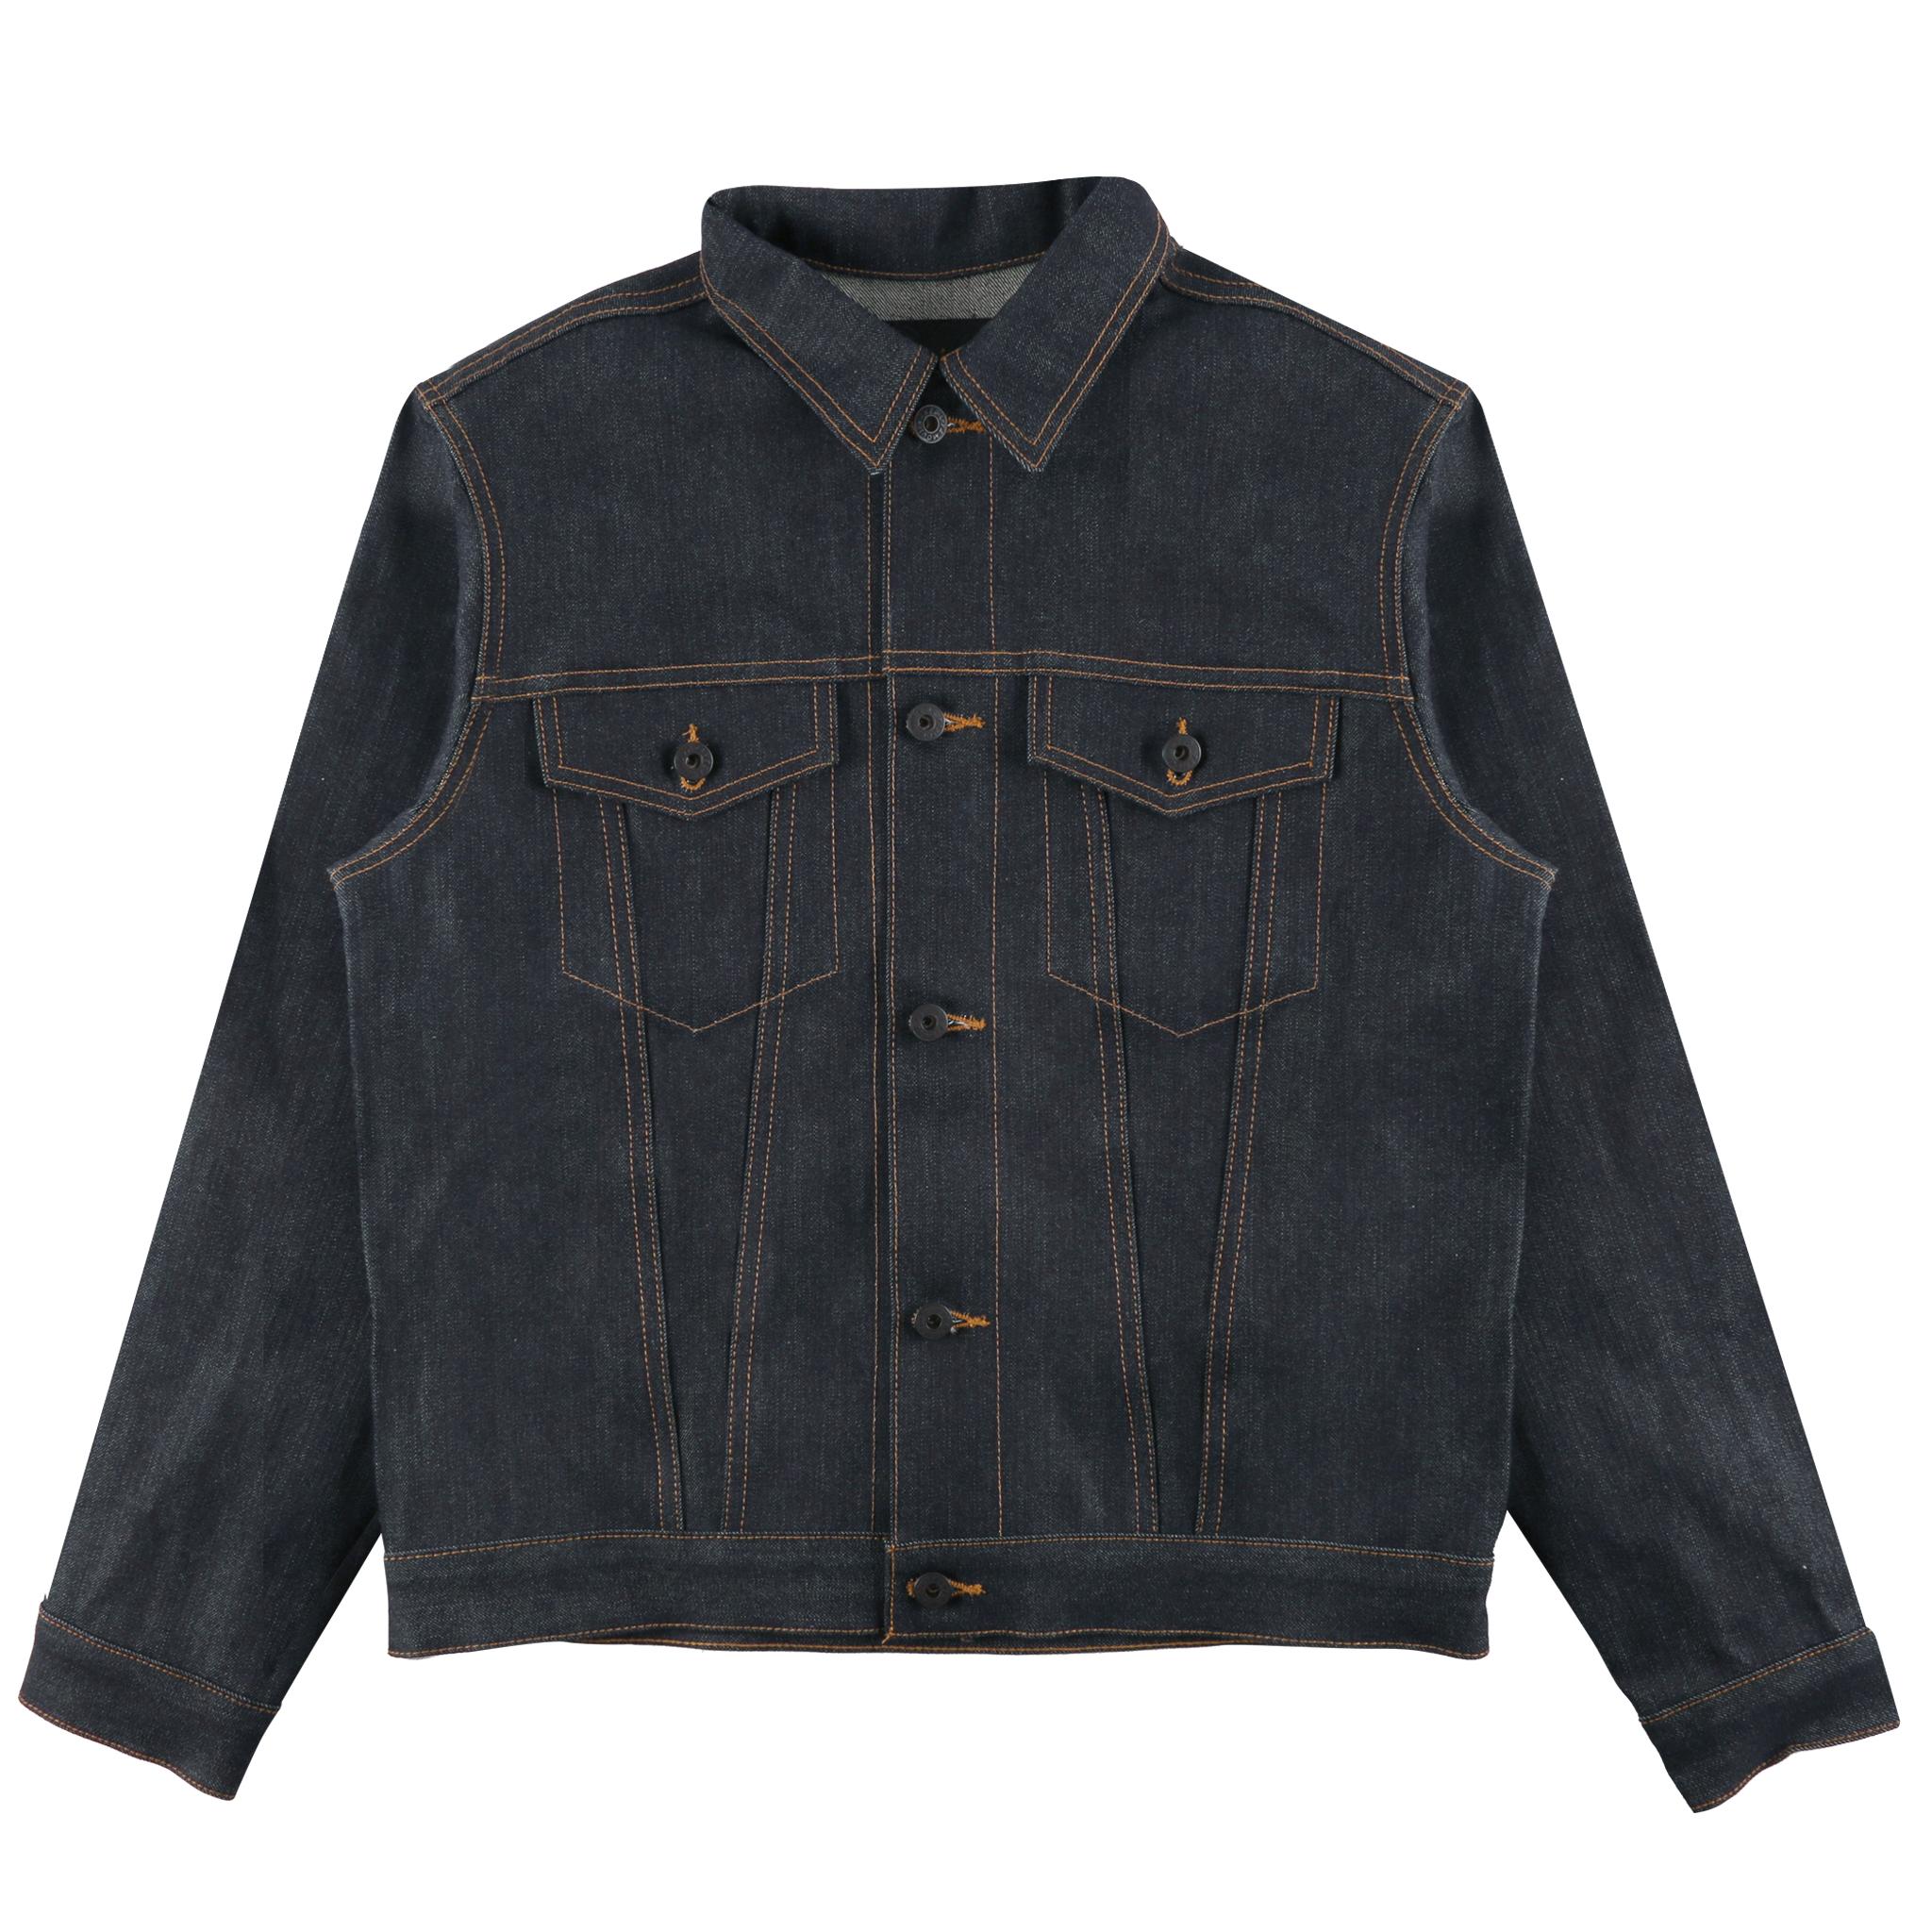 GUARDIAN SELVEDGE - Denim Jacket